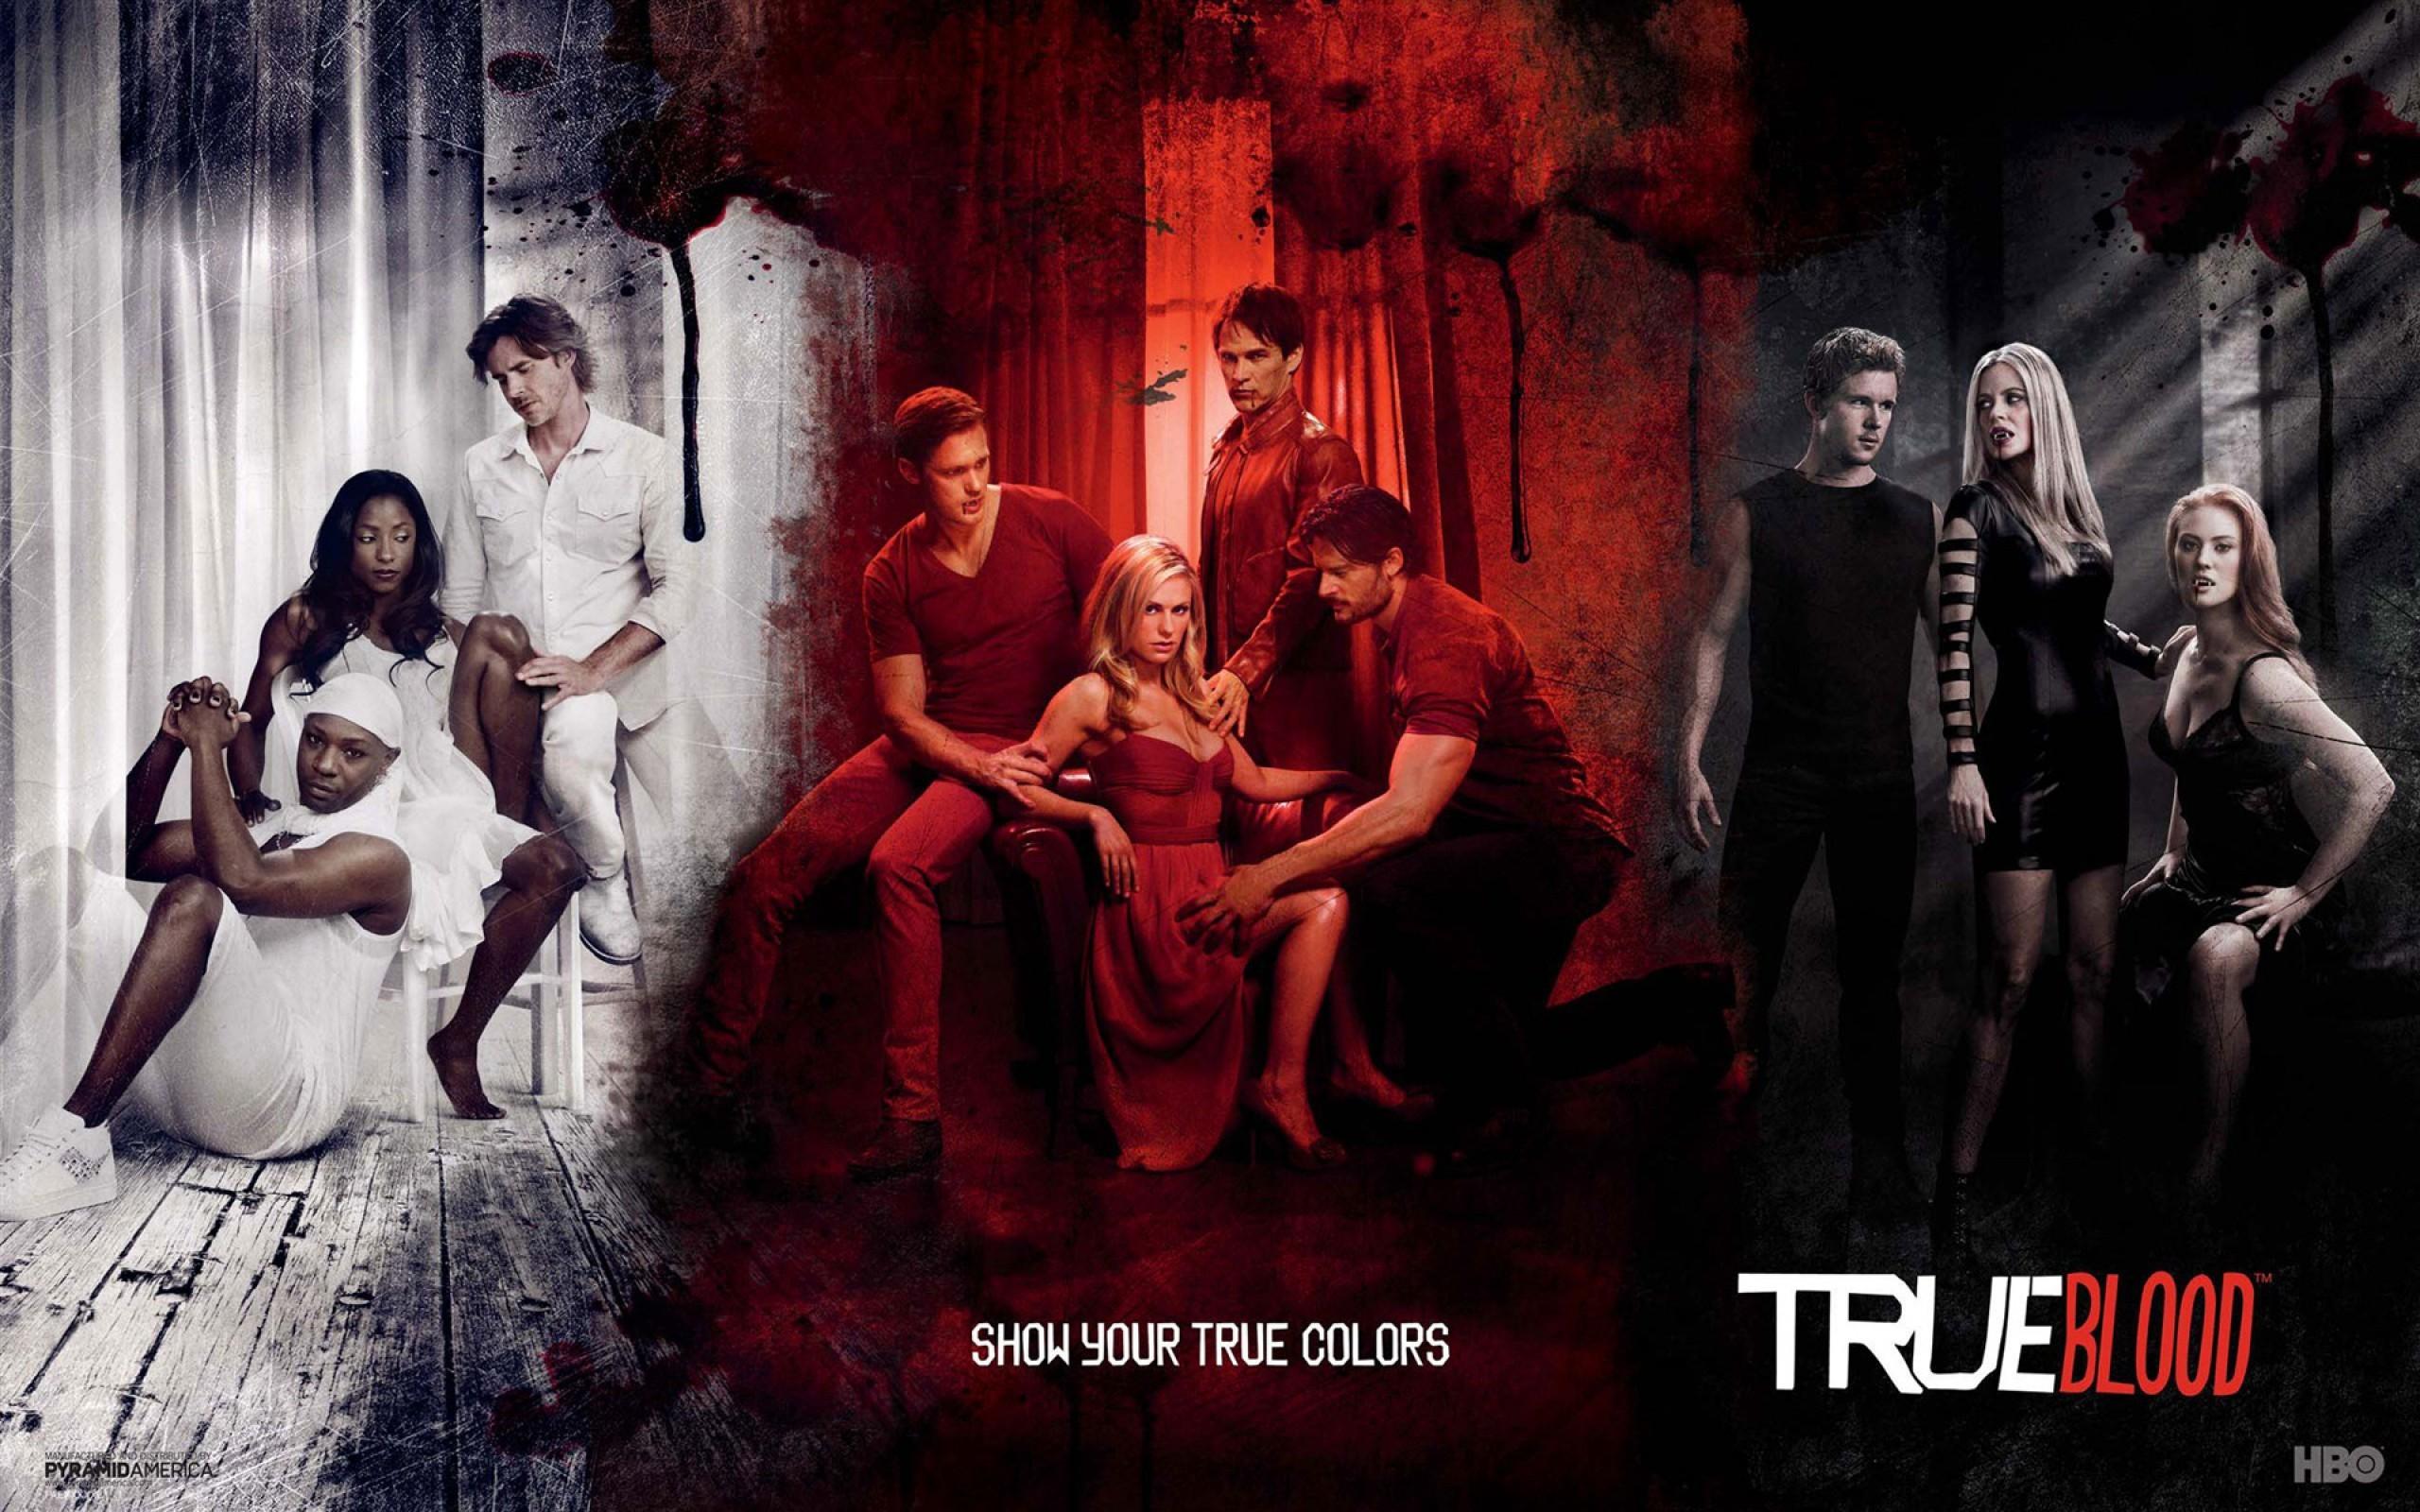 True blood backgrounds ·①.